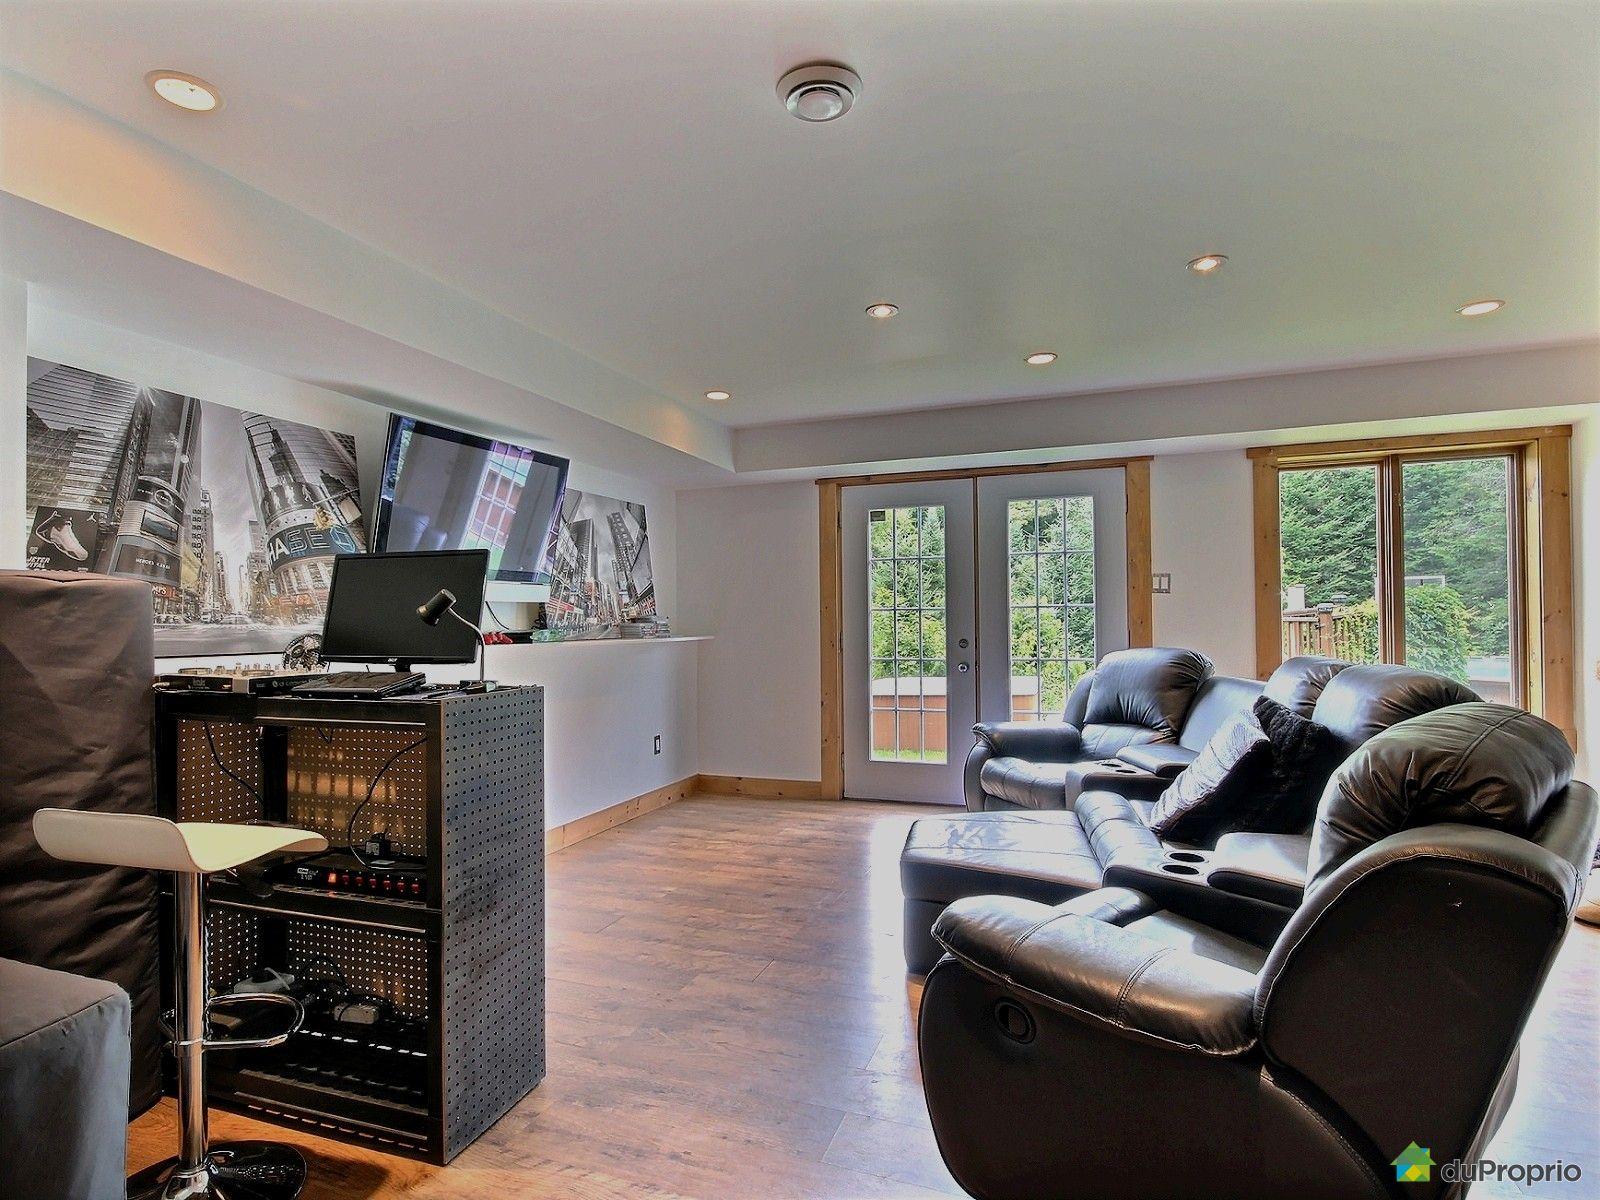 maison vendu ste ad le immobilier qu bec duproprio 411972. Black Bedroom Furniture Sets. Home Design Ideas